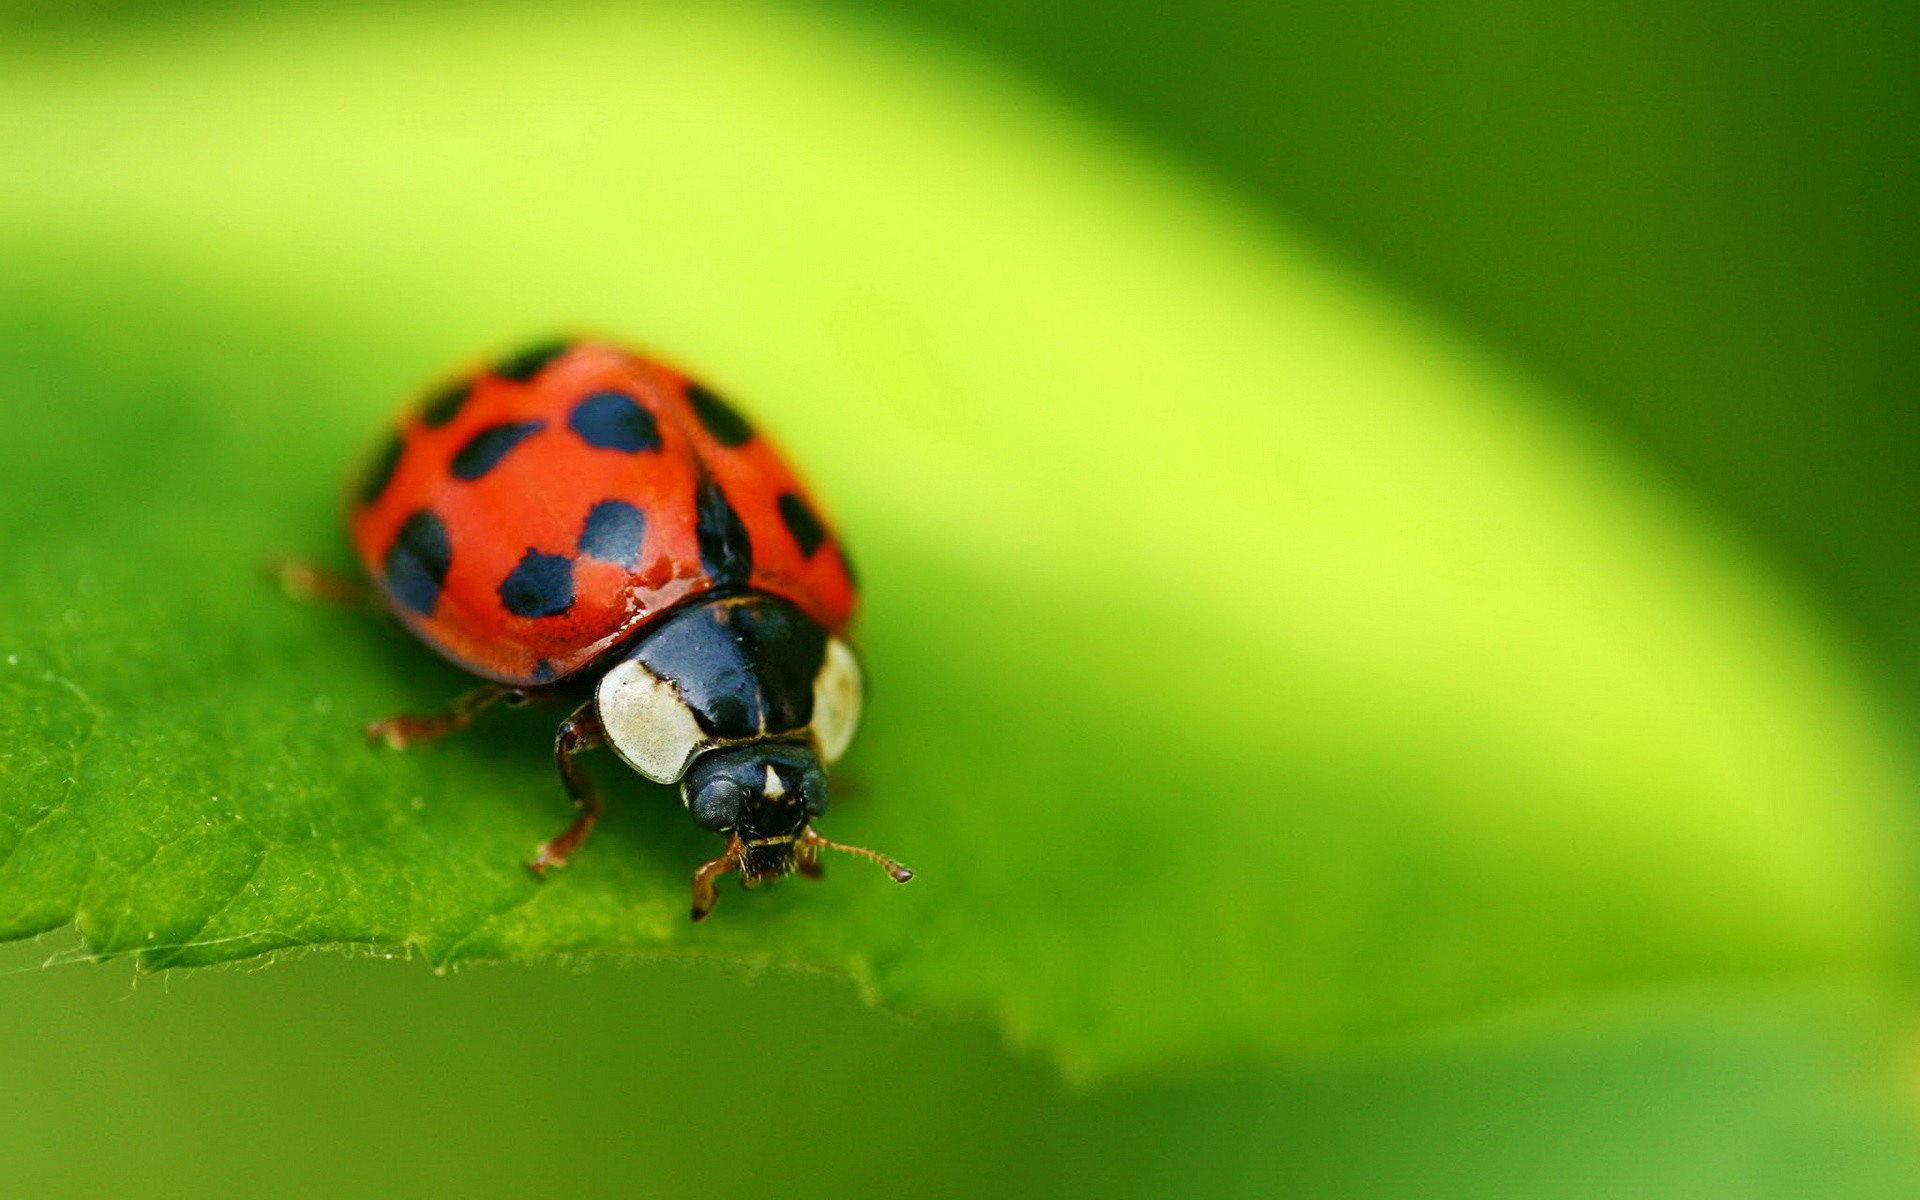 photography   Beautiful Ladybugs Macro Photography HD Wallpaper 1920x1200